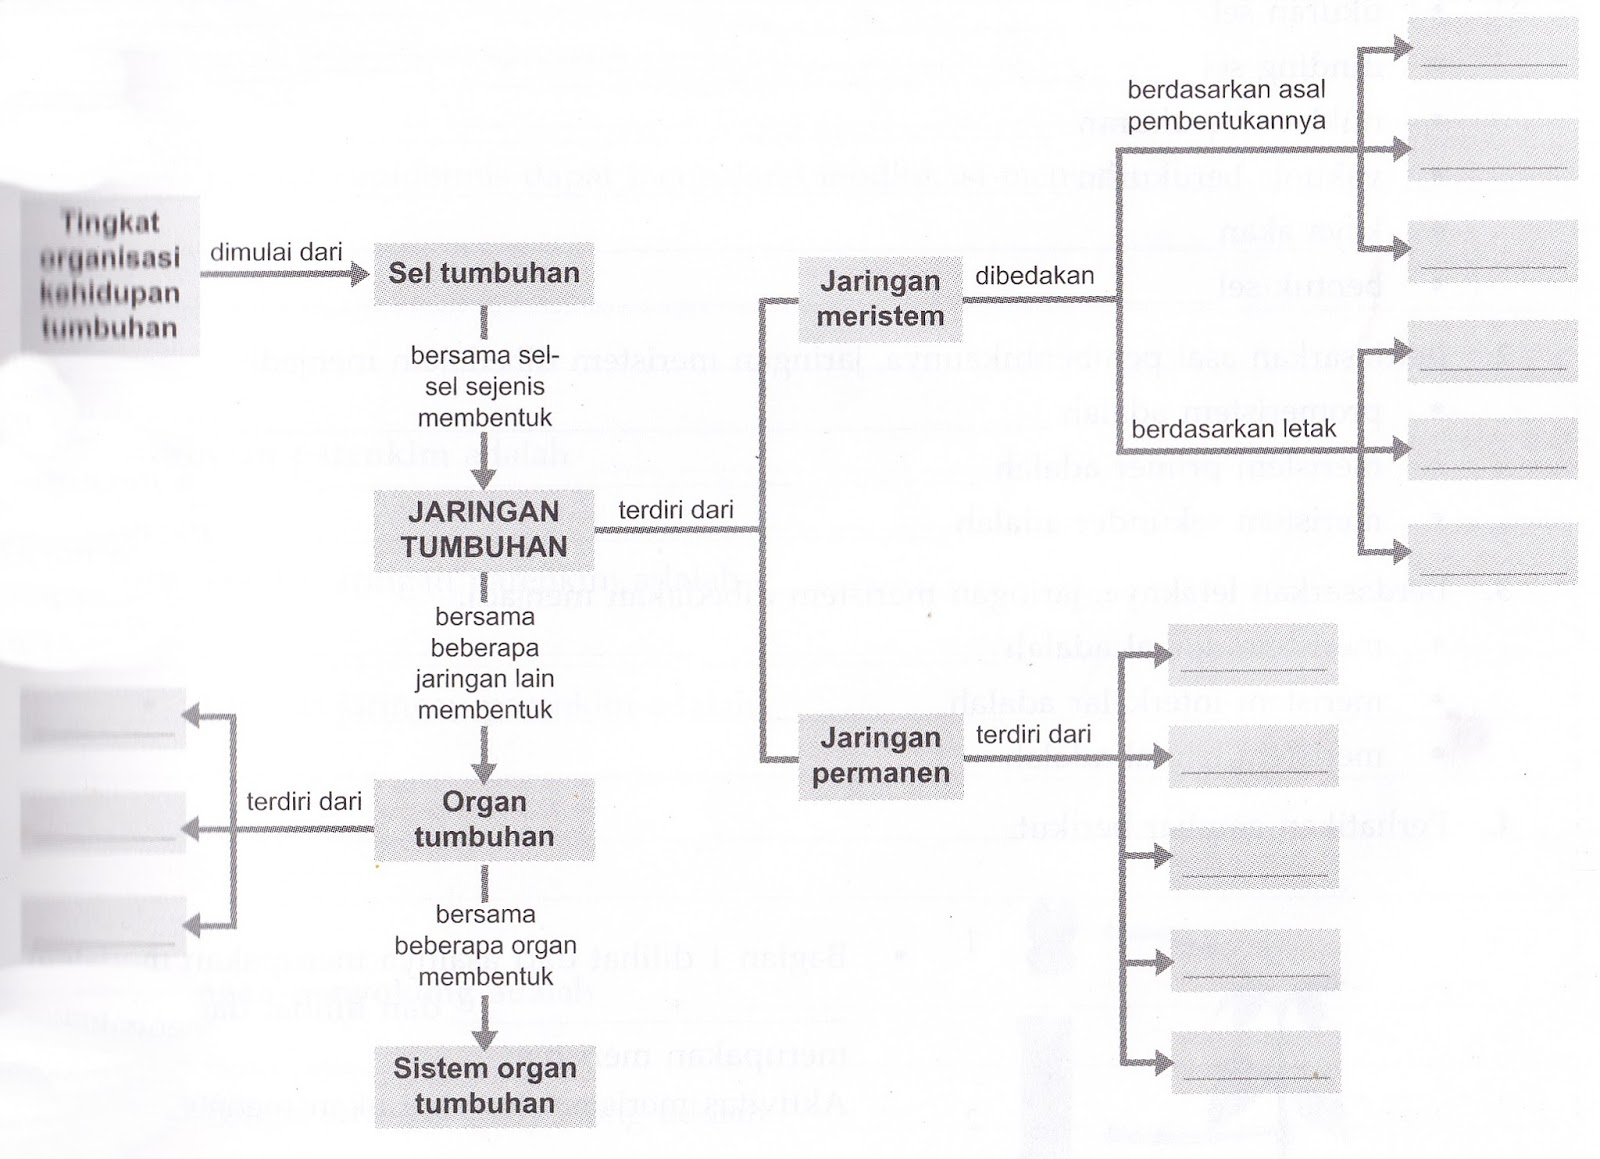 Remarkable of biology peta konsep sel struktur dan fungsi struktur dan fungsi jaringan pada tumbuhan ccuart Choice Image